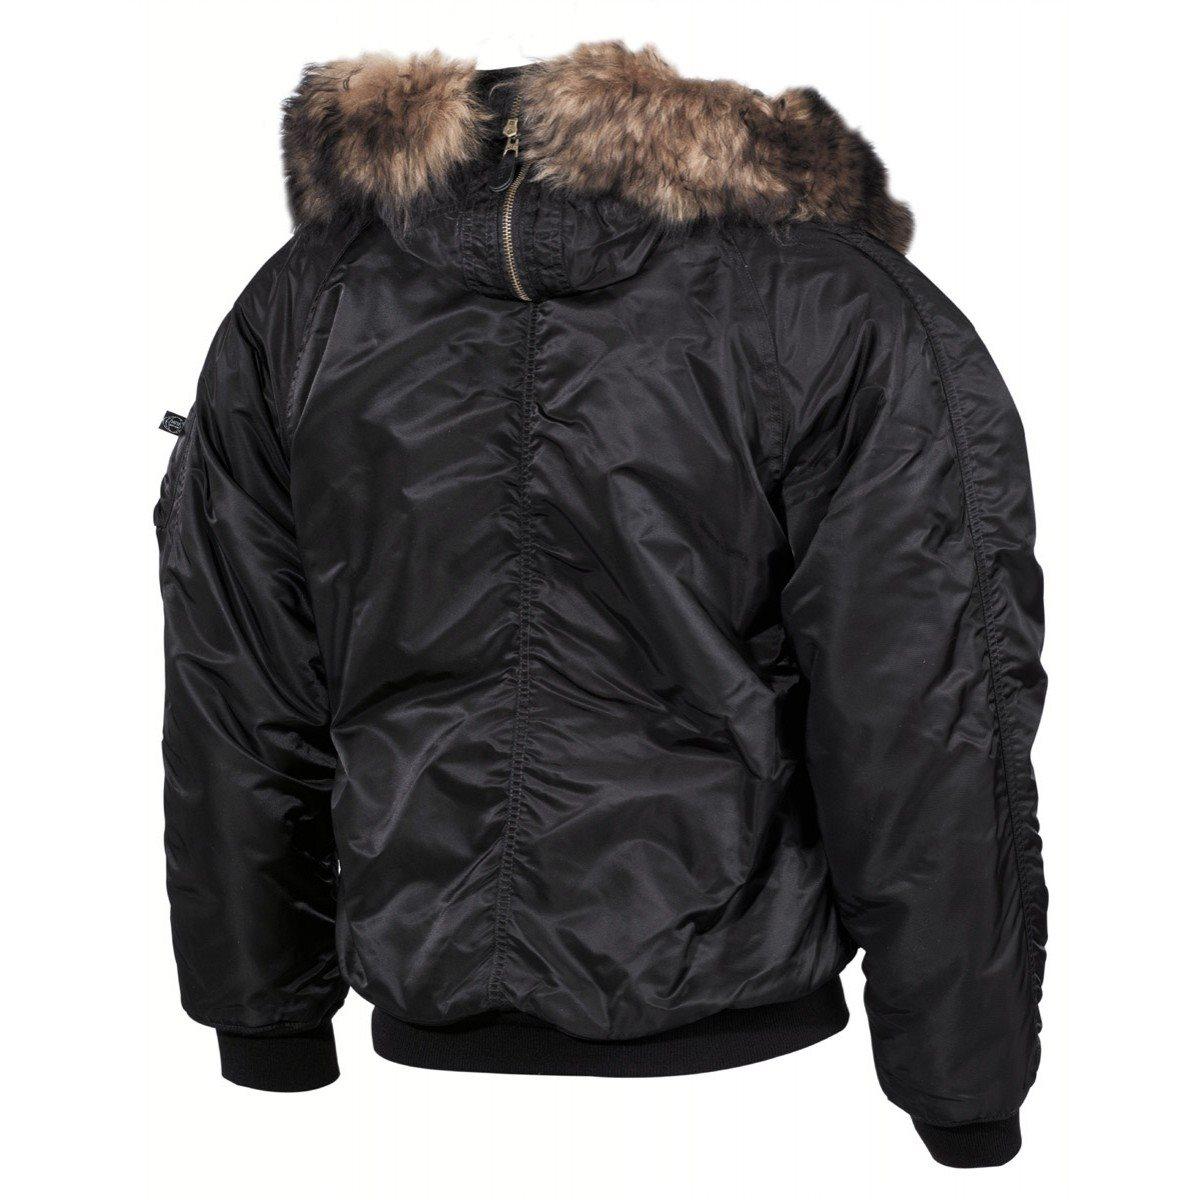 Jacket hooded N2B POLAR BLACK MFH int. comp. 03702A L-11